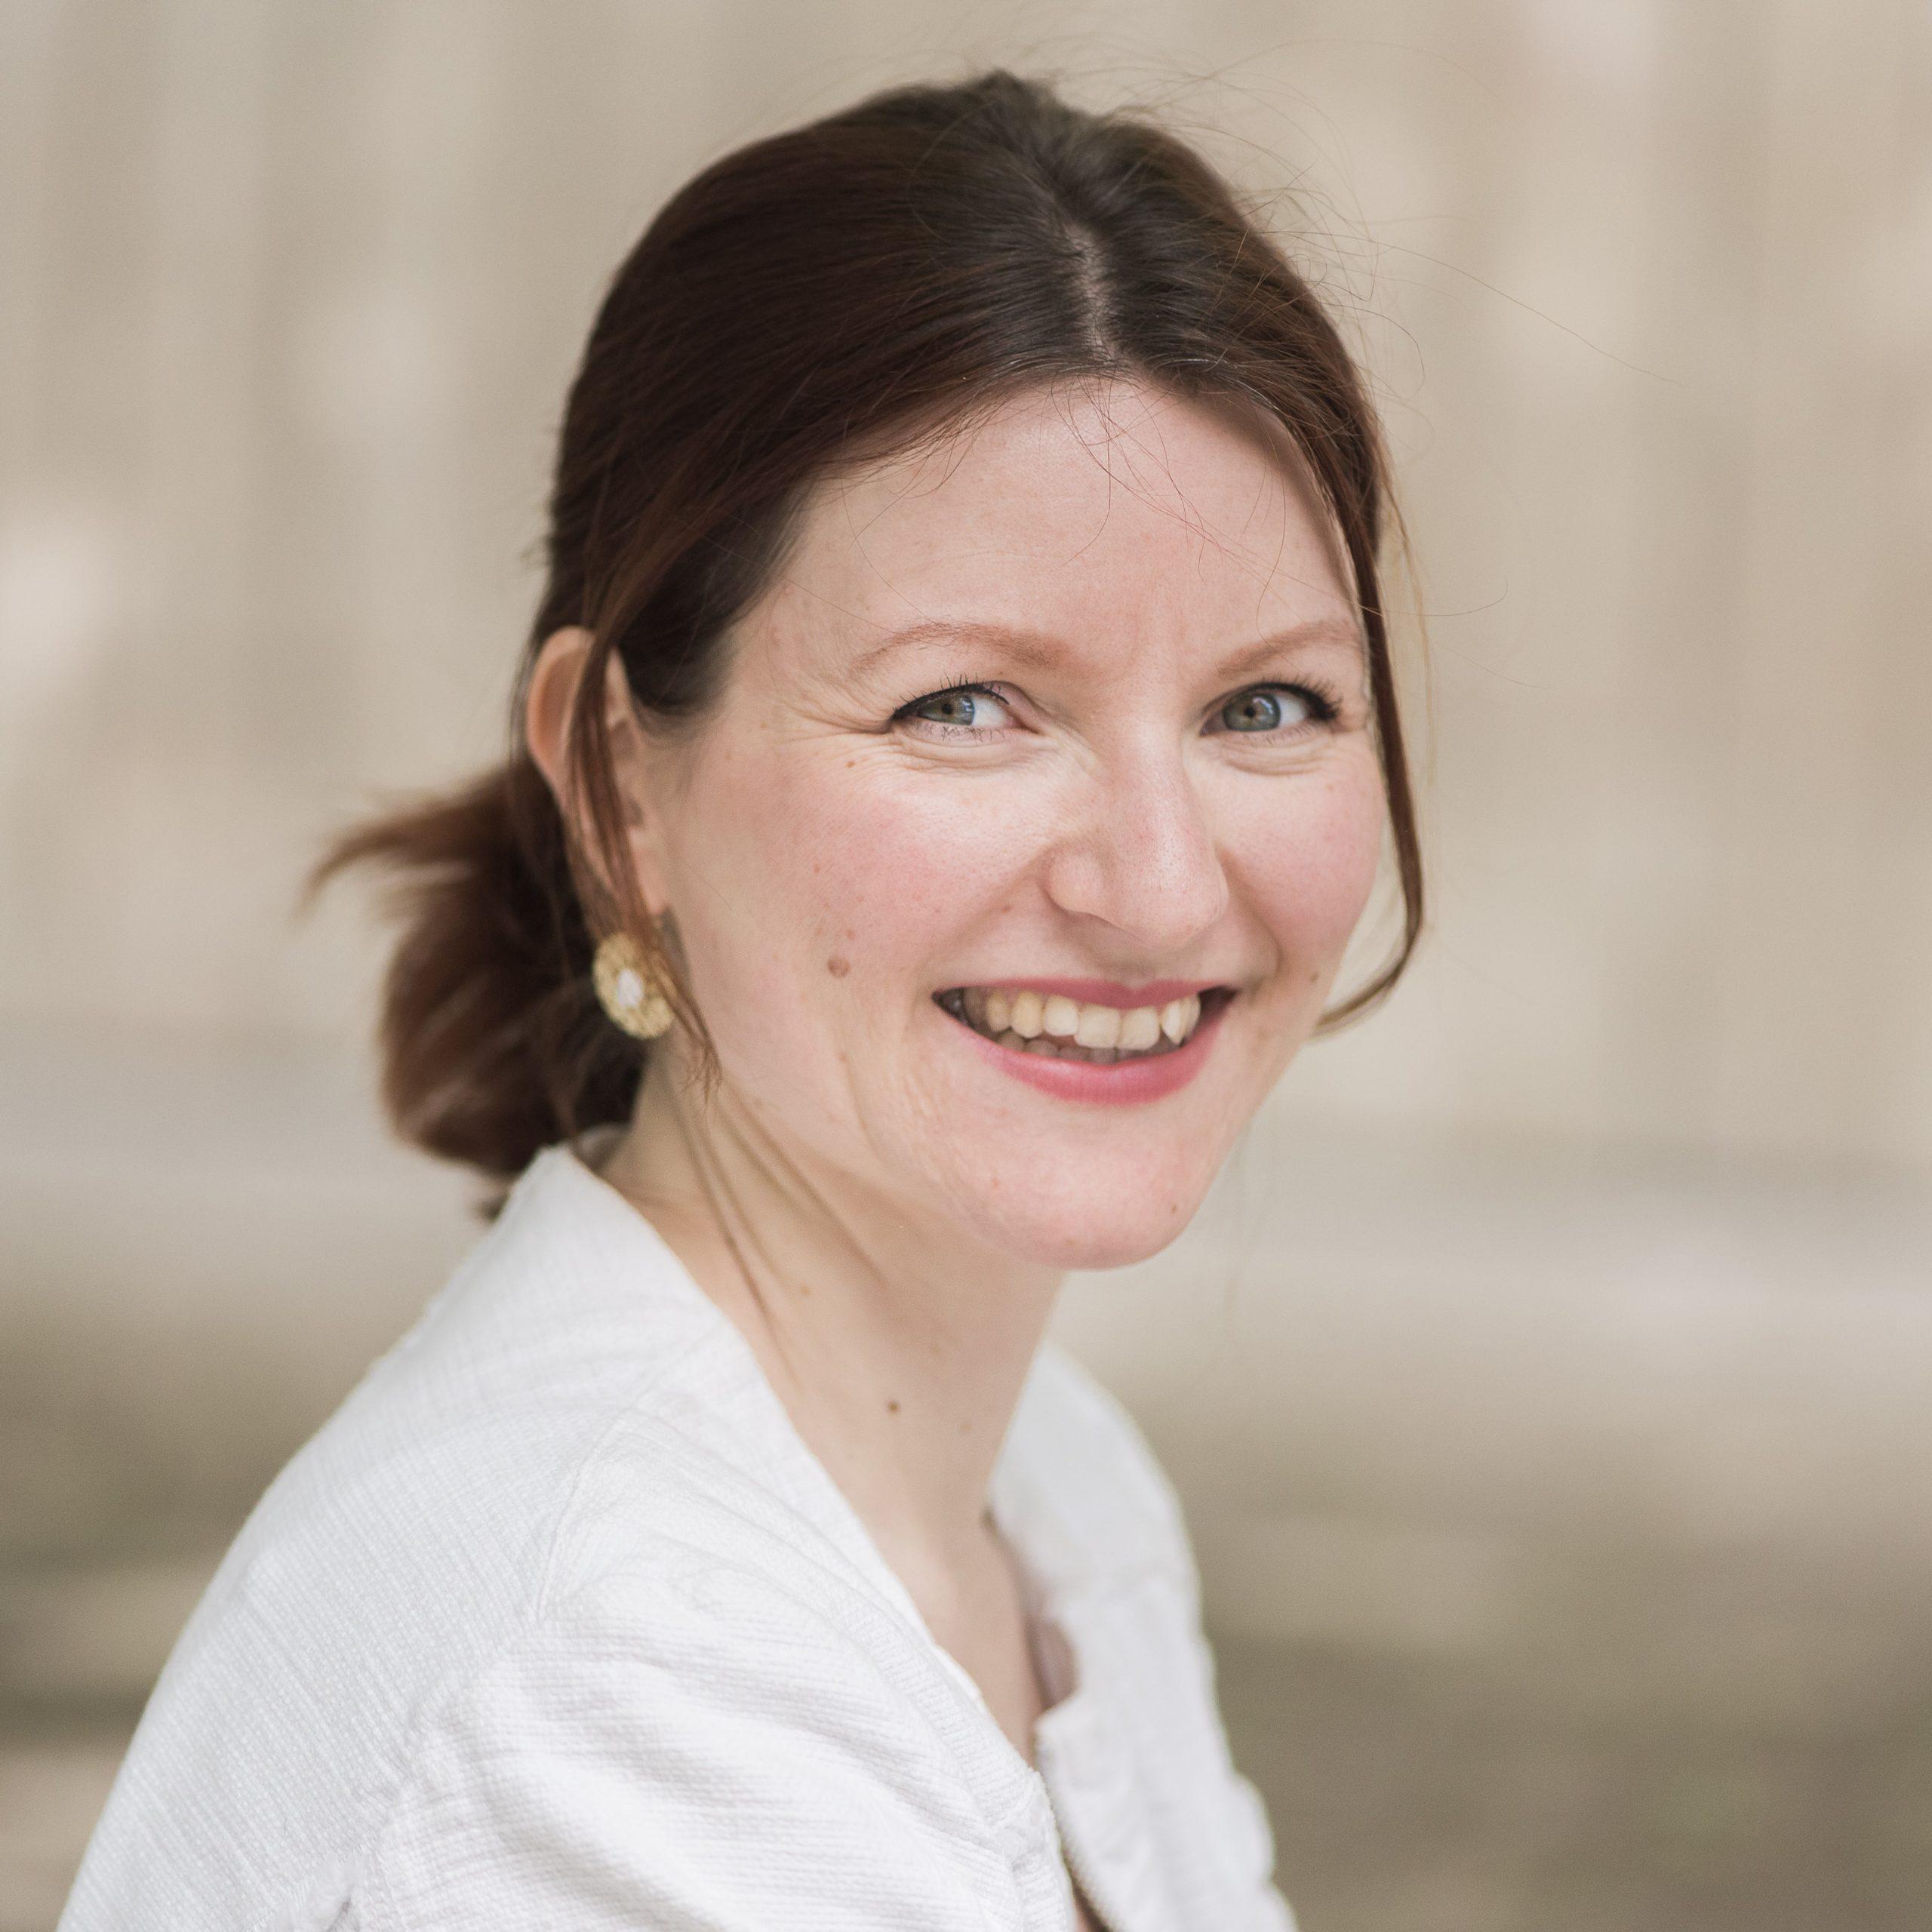 Maître Jessica Bathelier